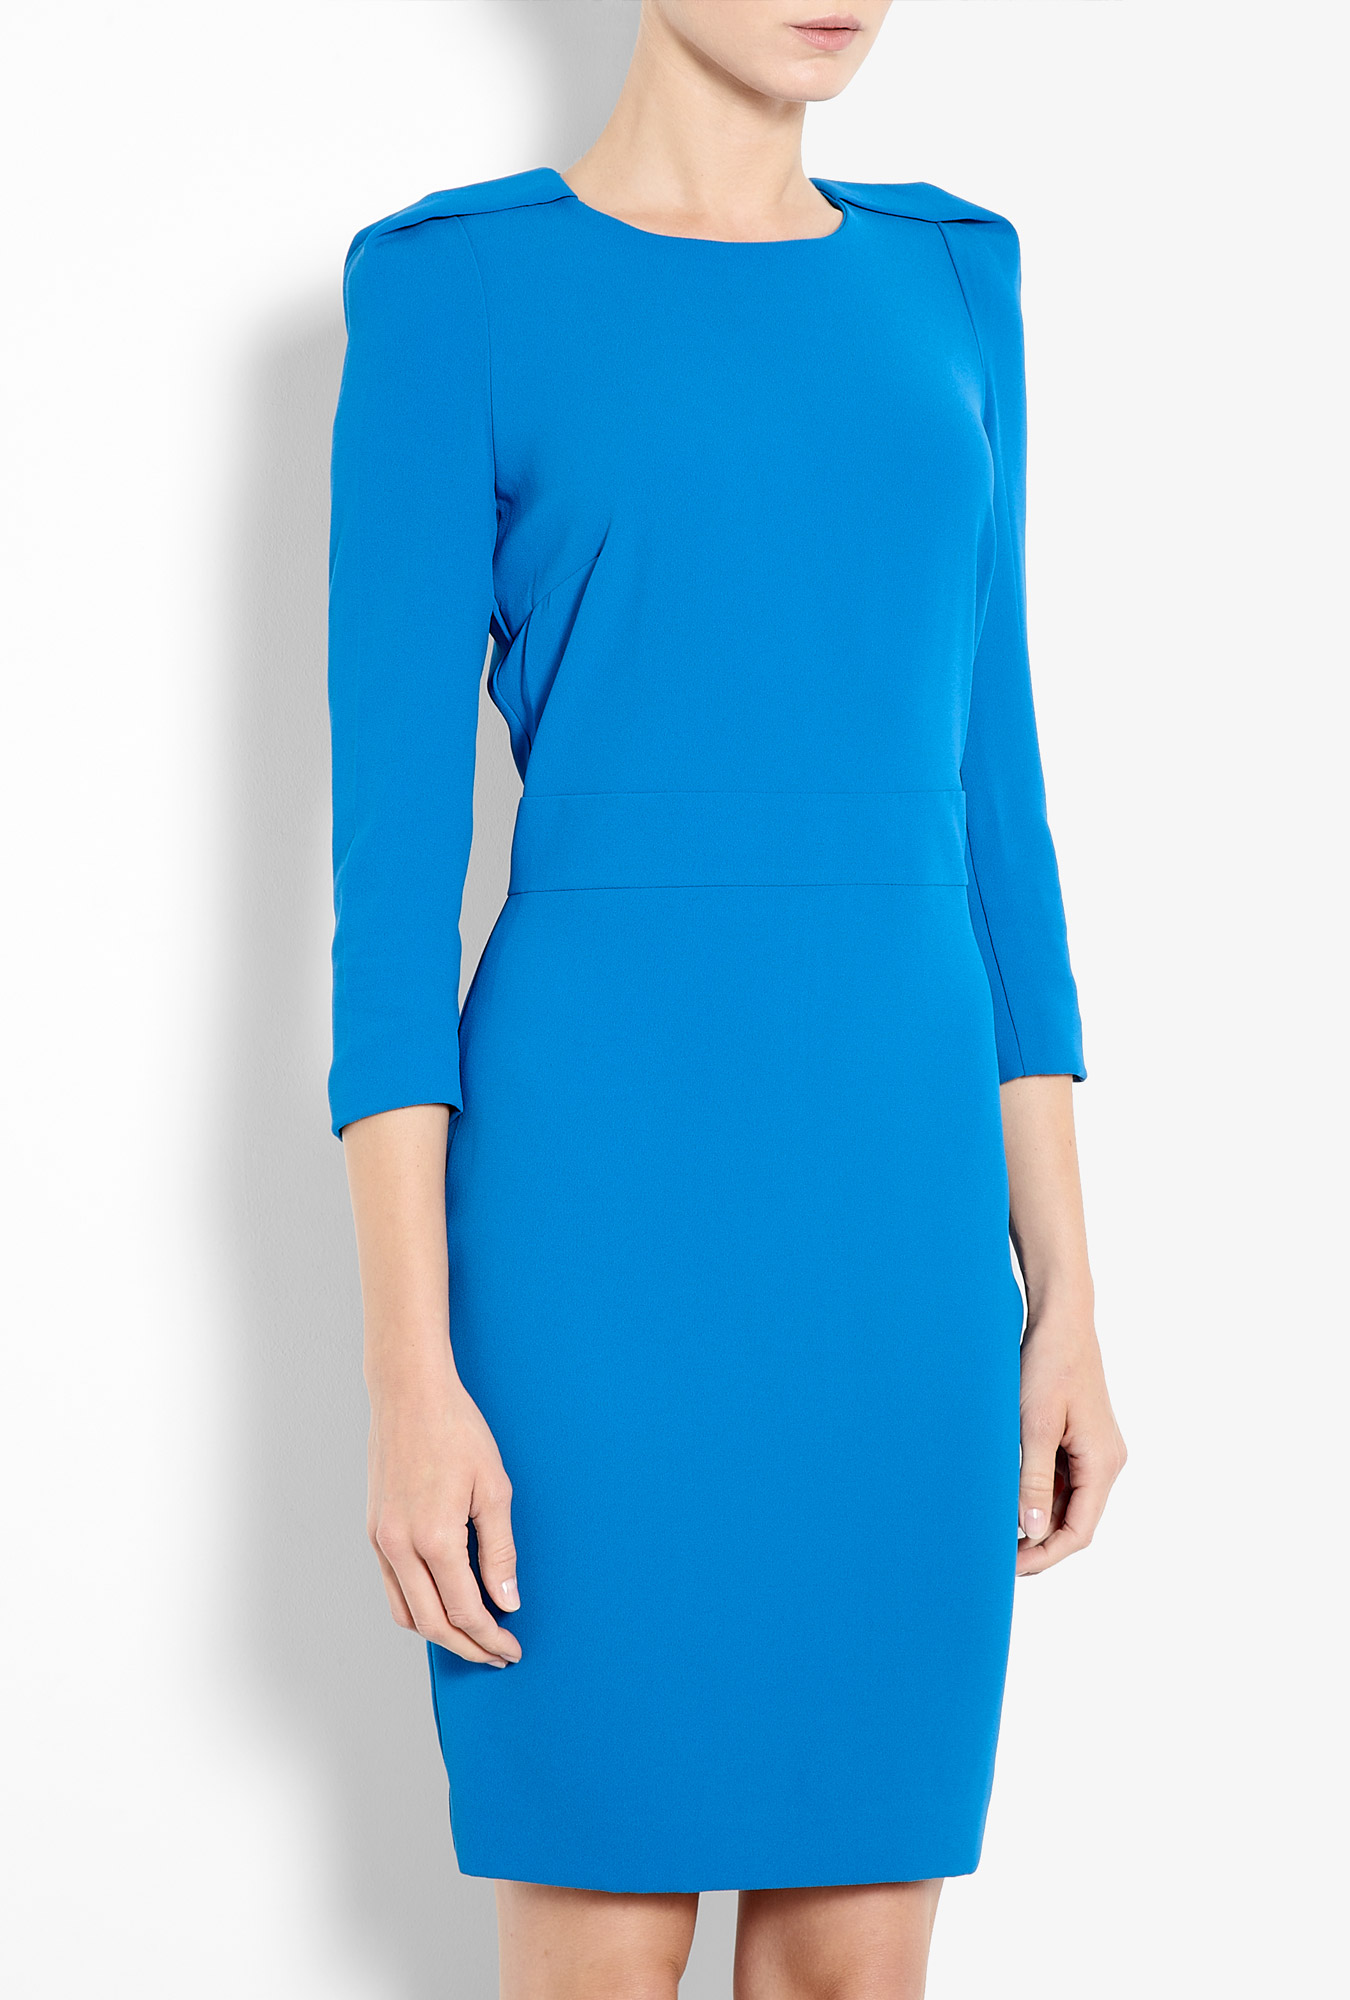 Ocean Blue Designer Dresses